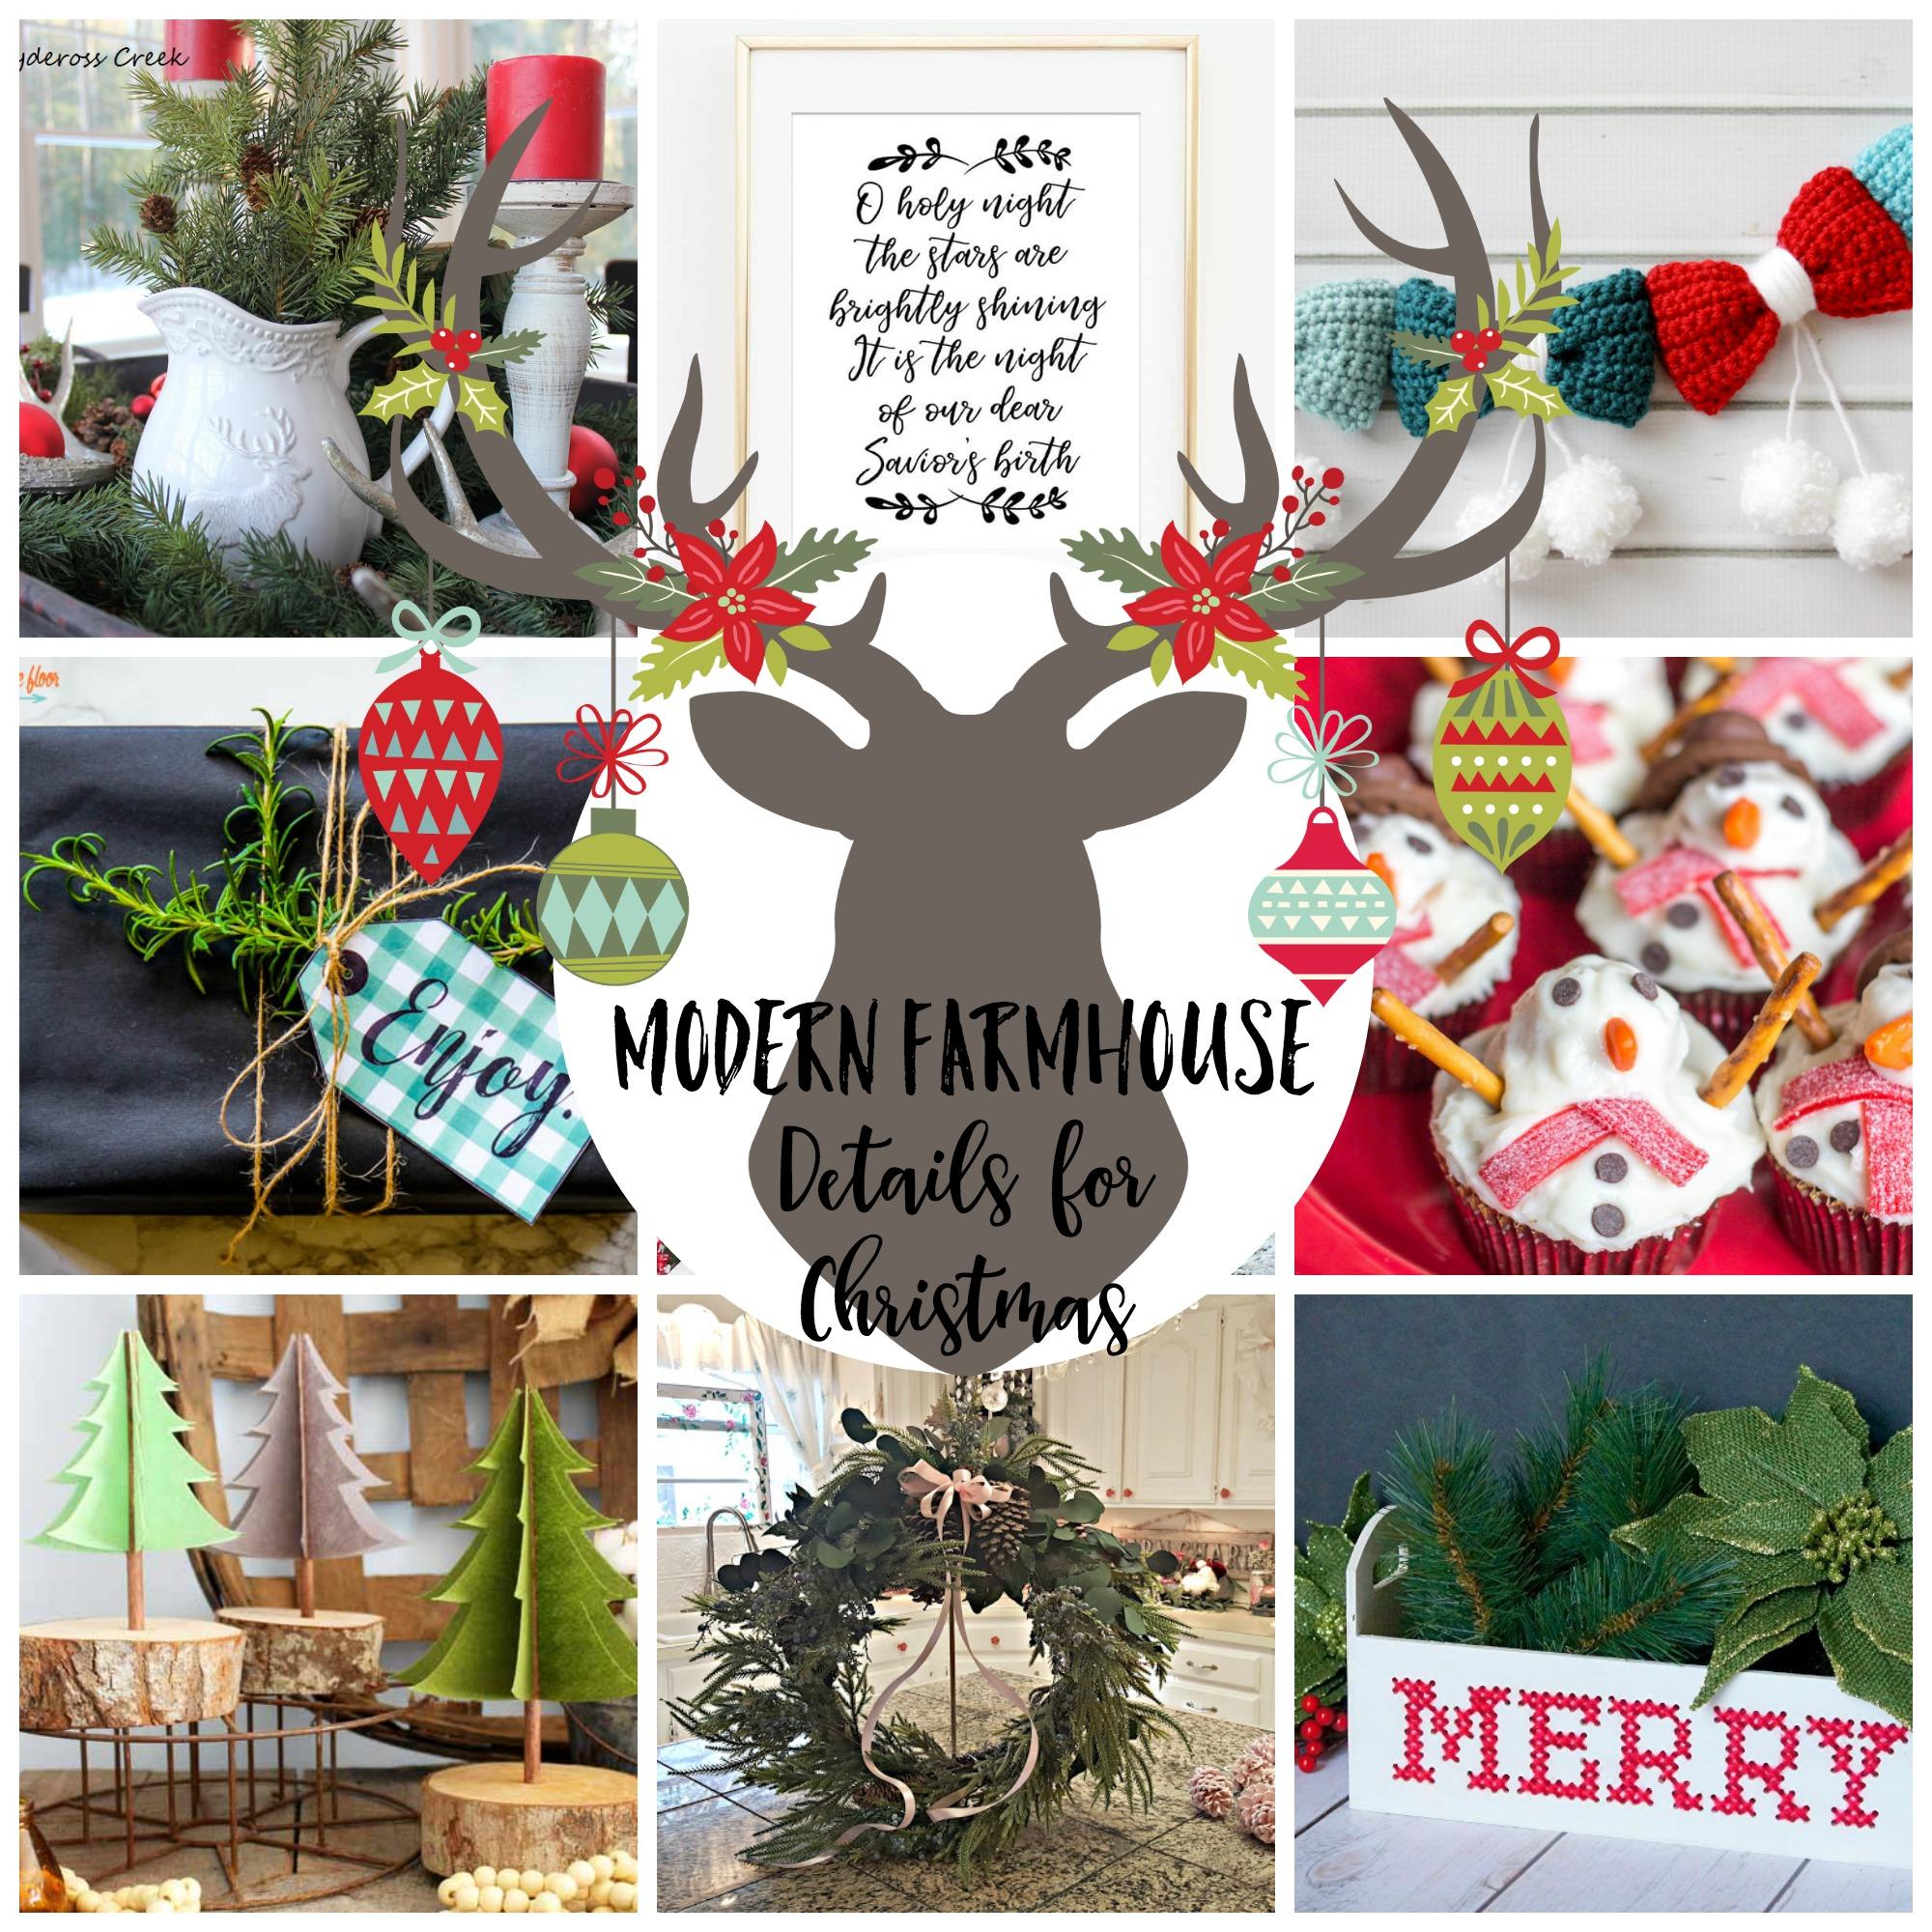 Farmhouse Details for Christmas